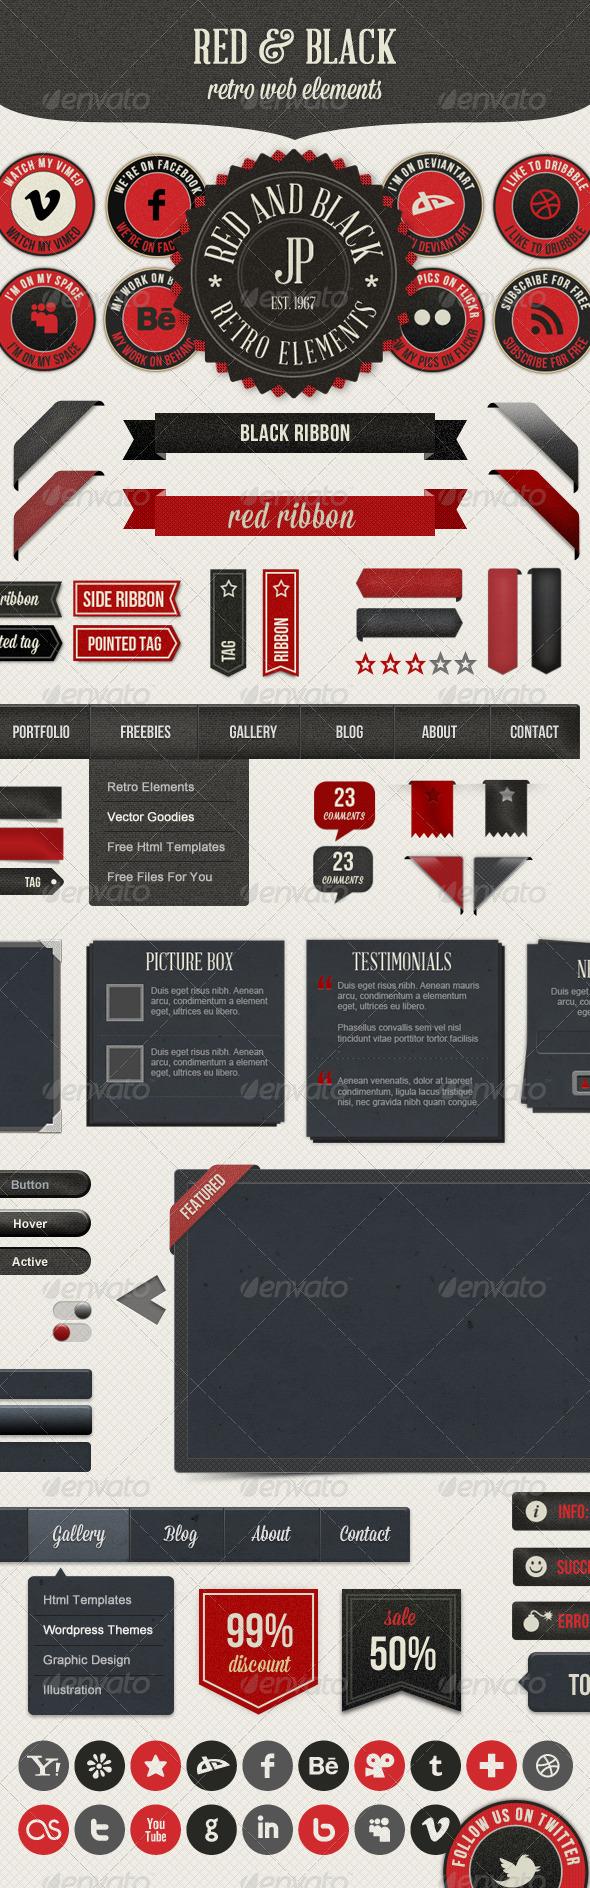 GraphicRiver Retro Web Elements Red & Black Pack 3013304